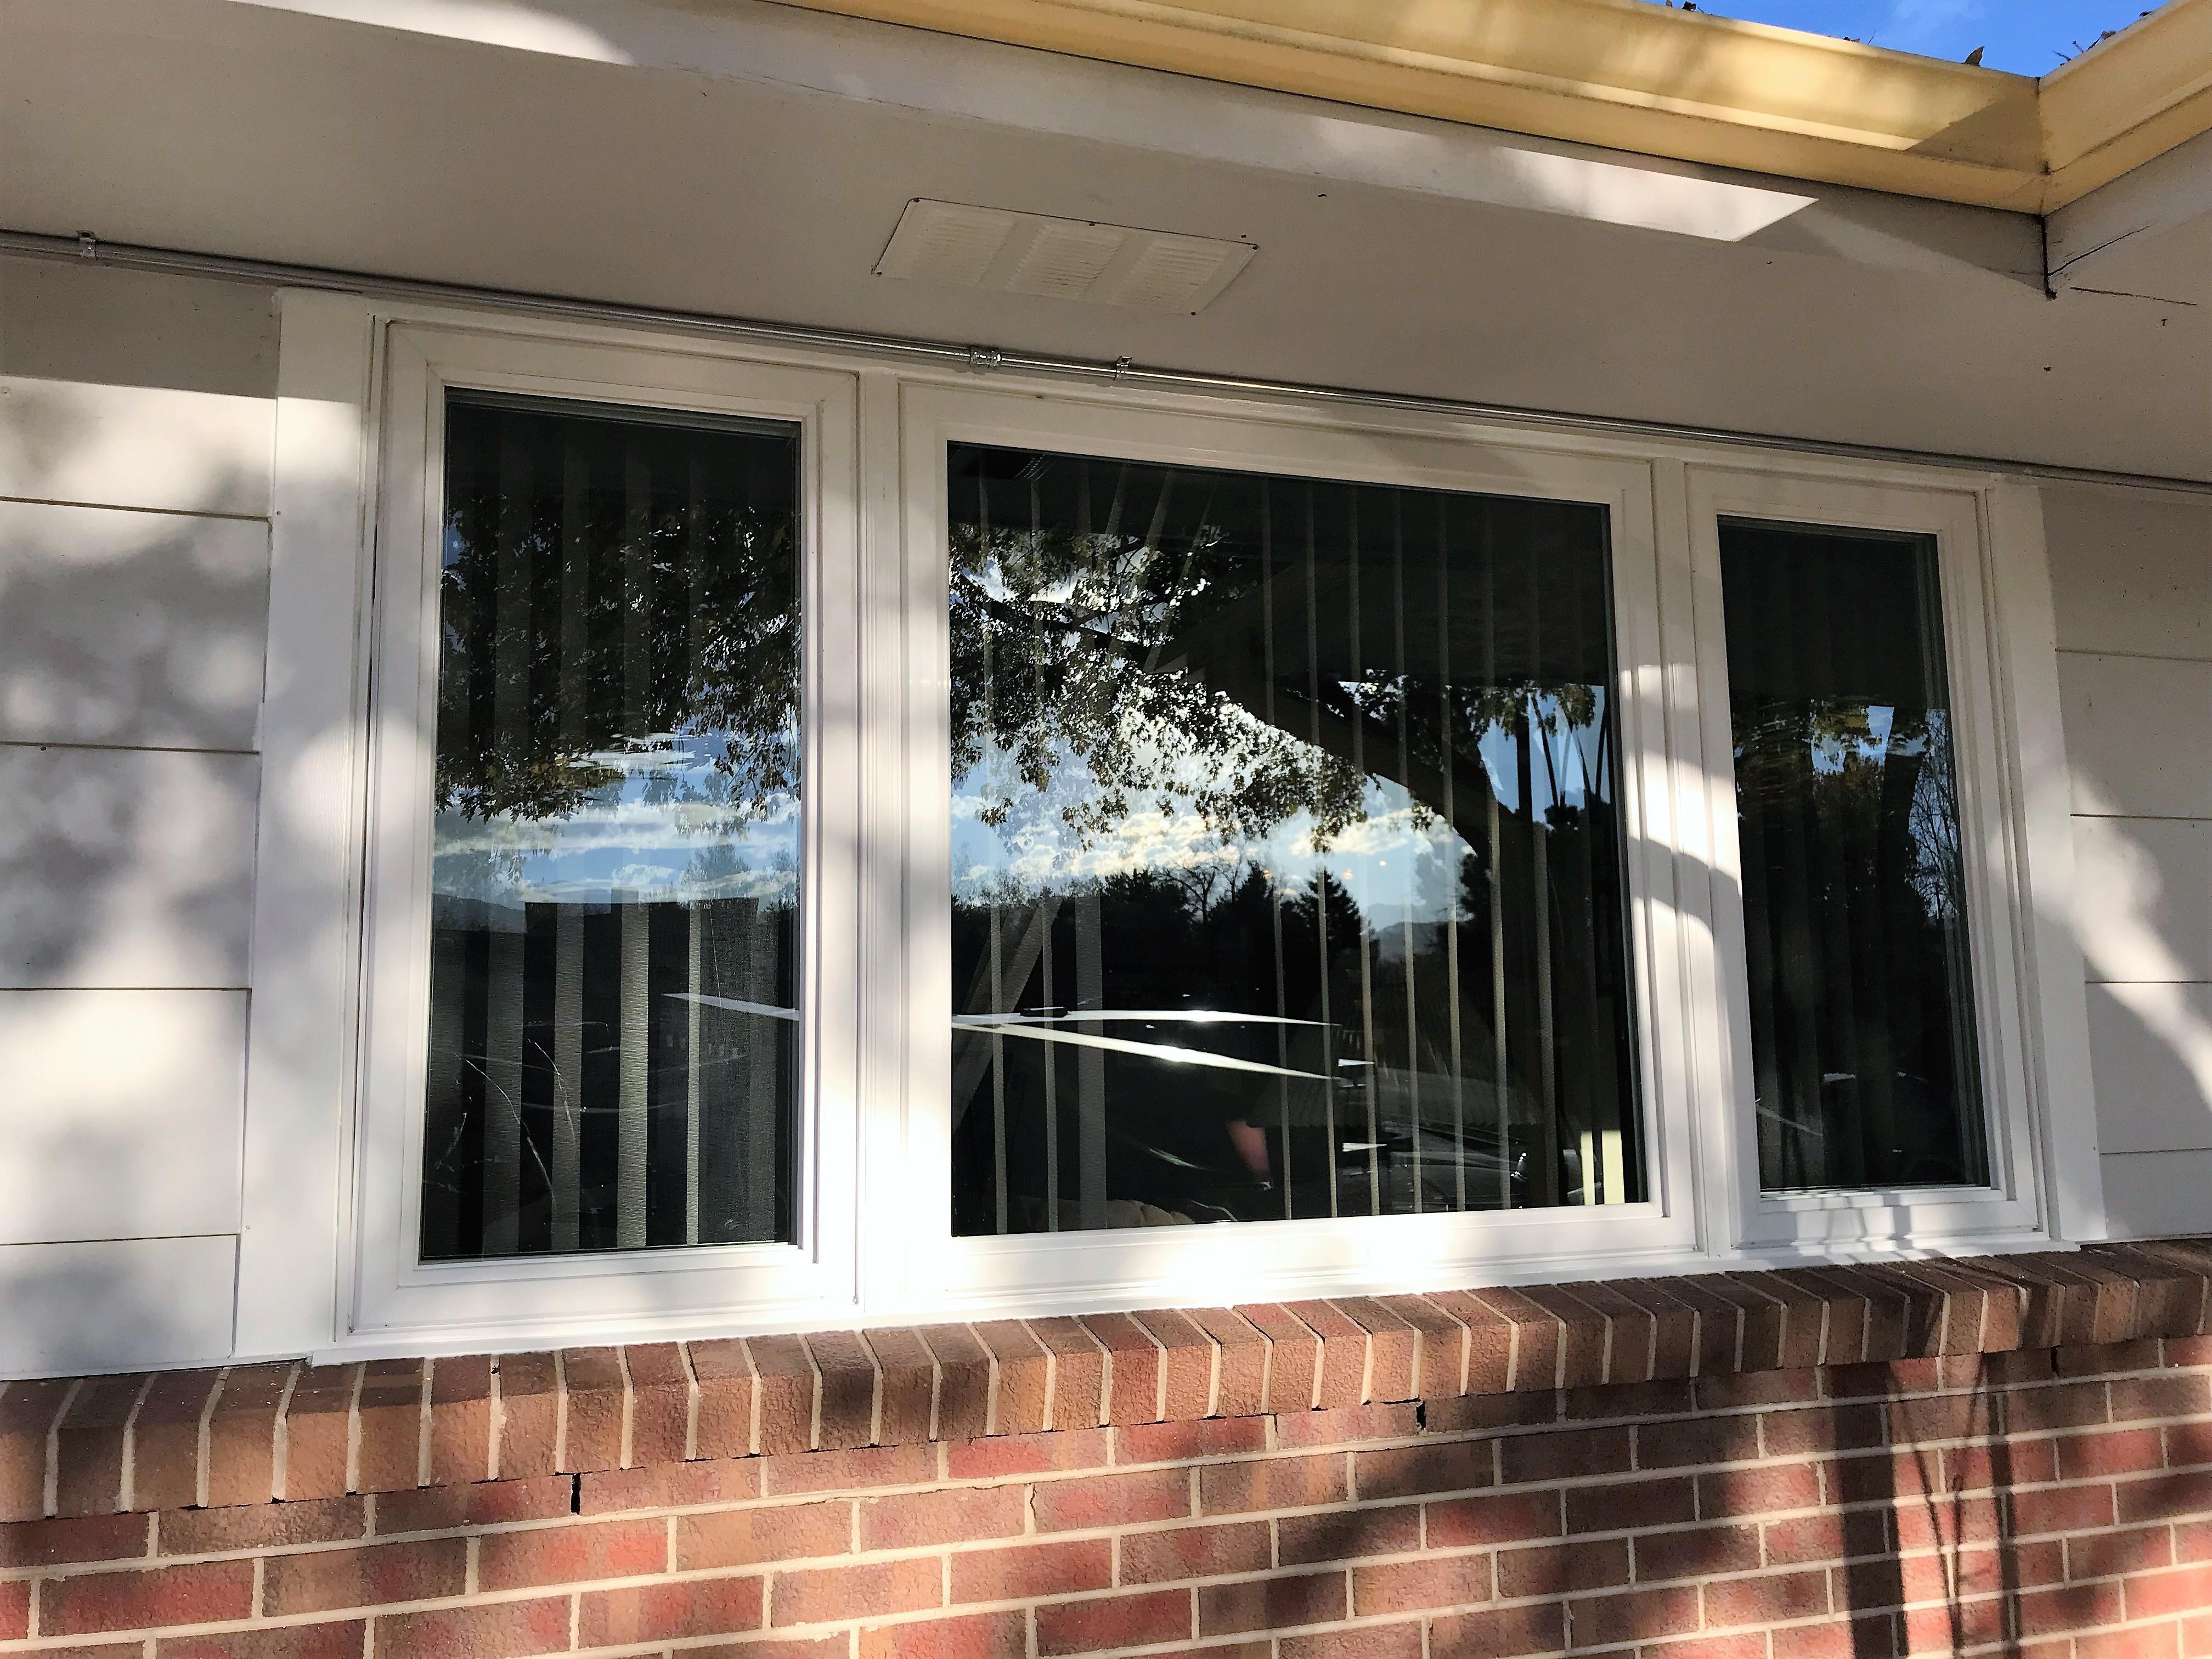 Simonton Reflections 5500 Three Lite Casement Window